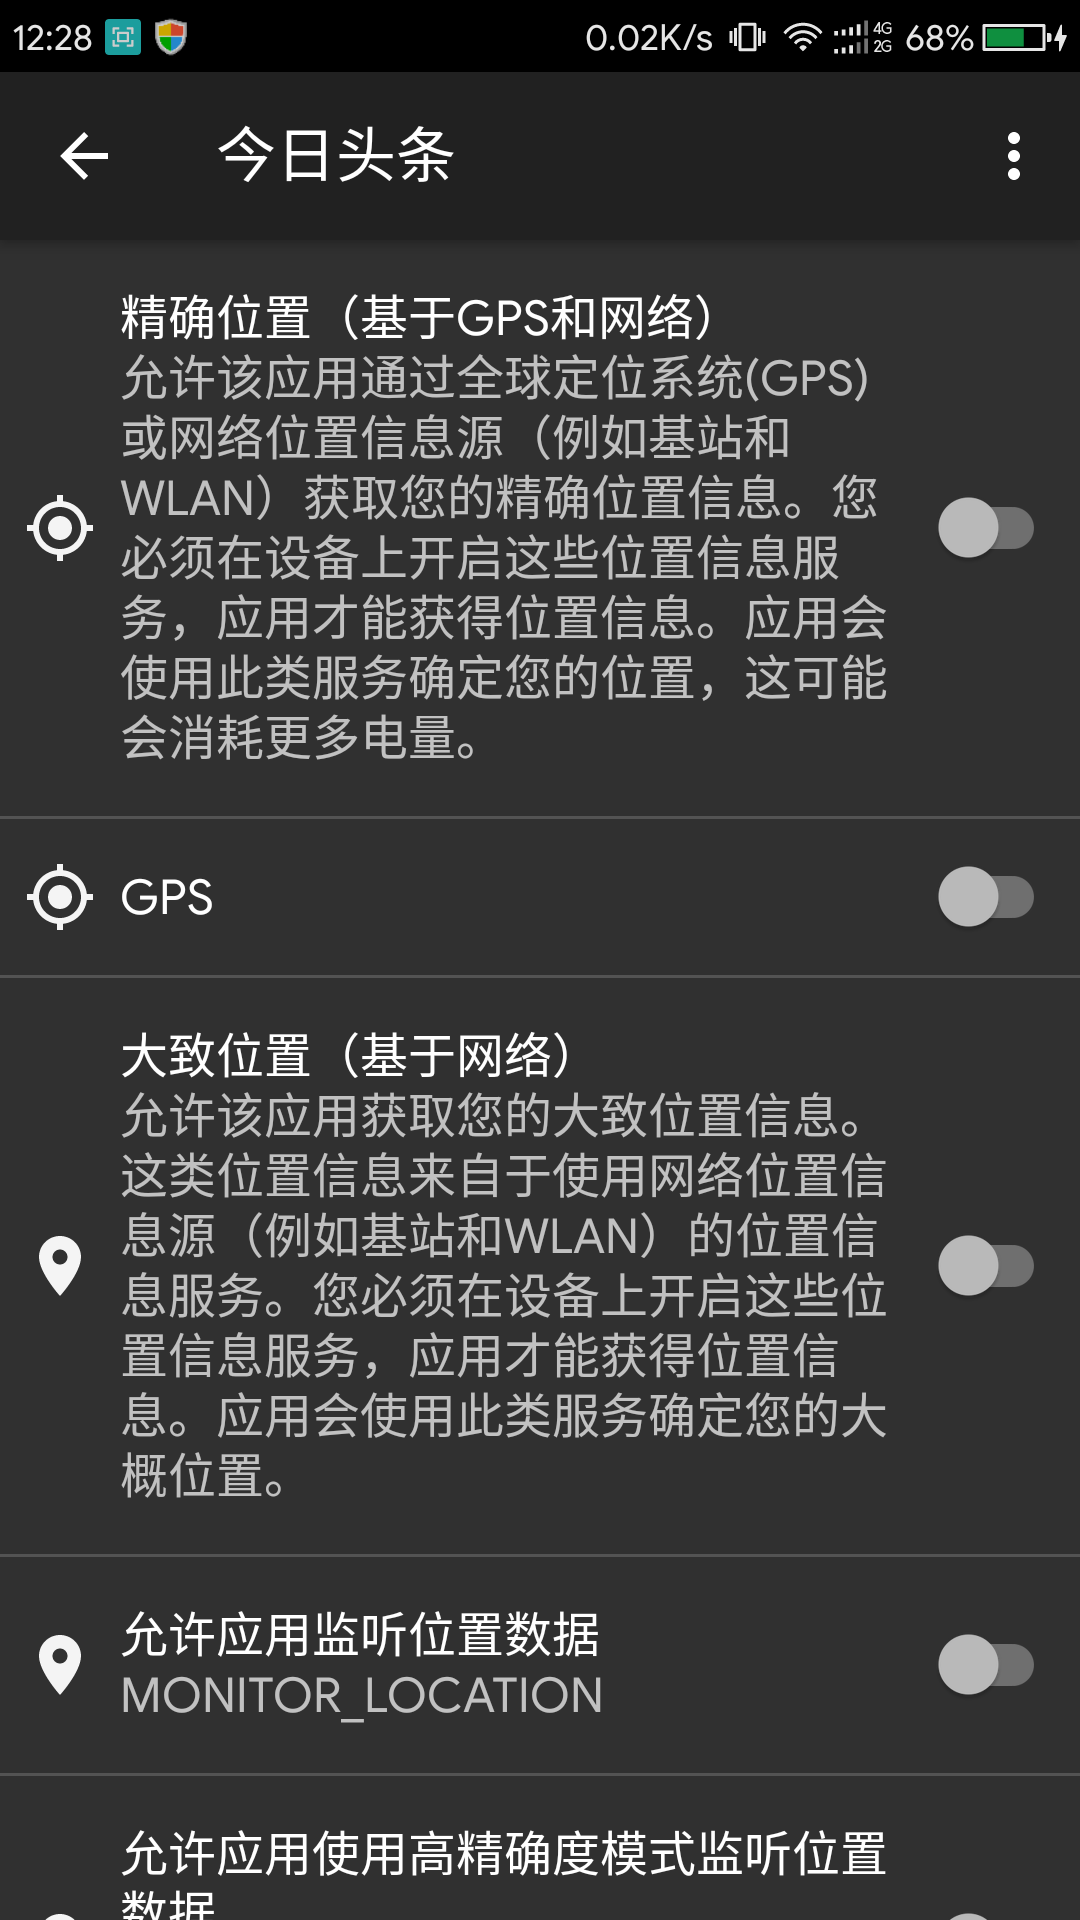 Screenshot_2020-02-29-12-28-02.png